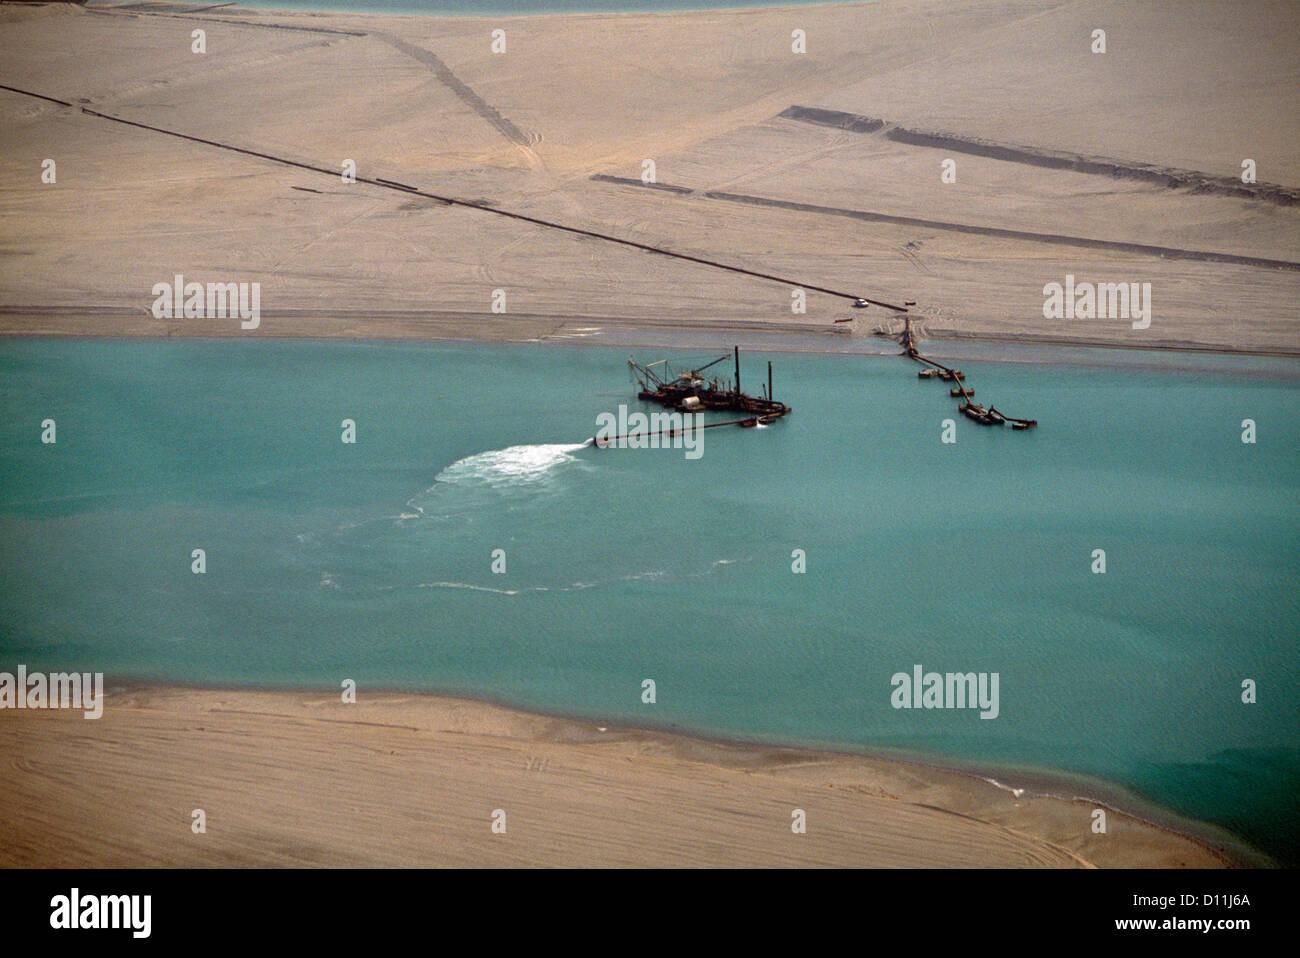 Dubai UAE Dredging In Dubai Creek Stock Photo: 52282002 - Alamy